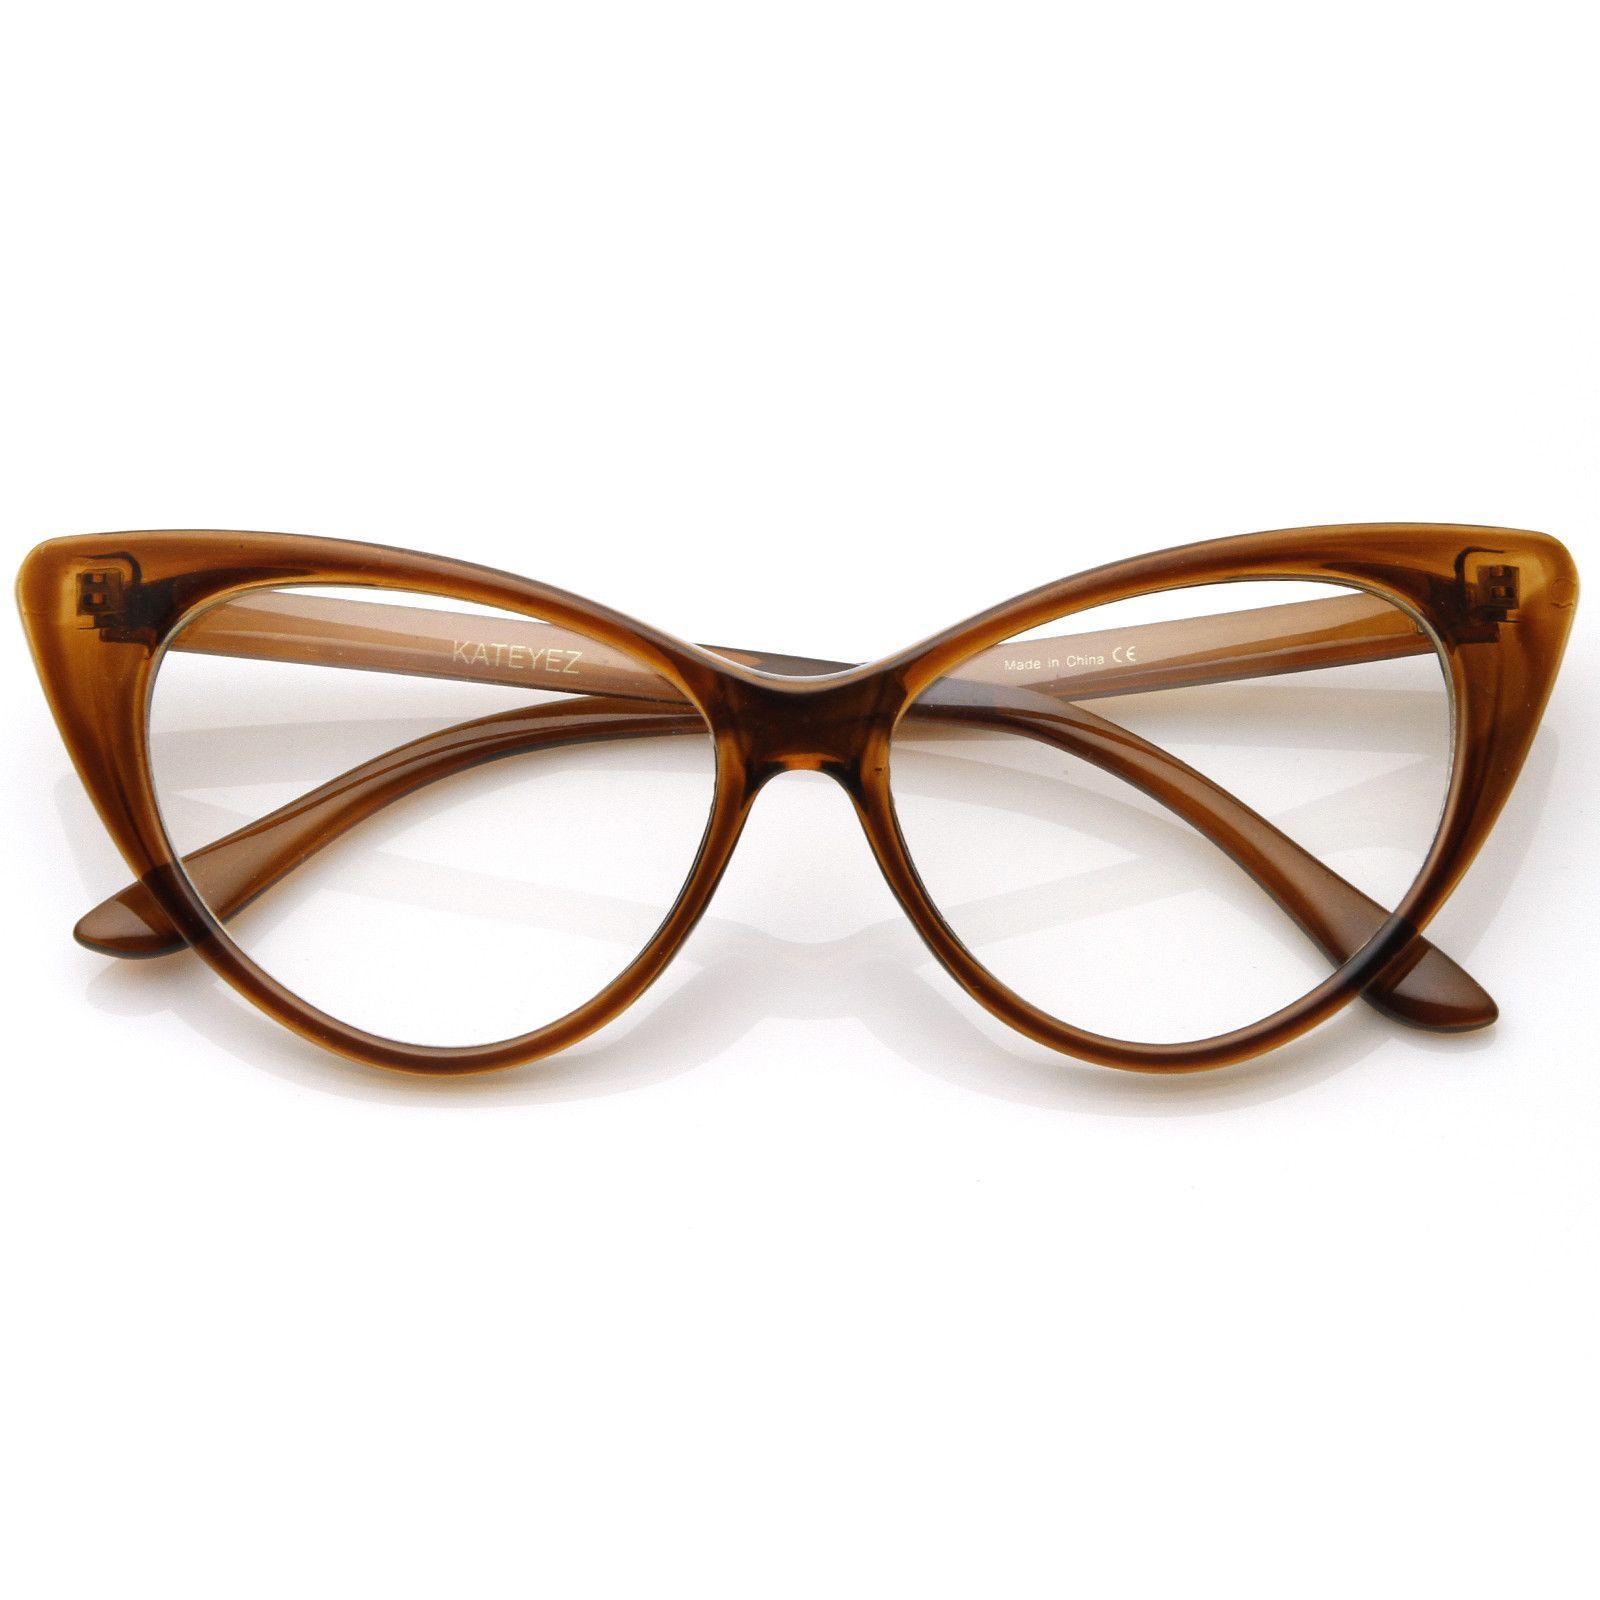 1950's Vintage Mod Fashion Cat Eye Clear Lens Glasses 8435